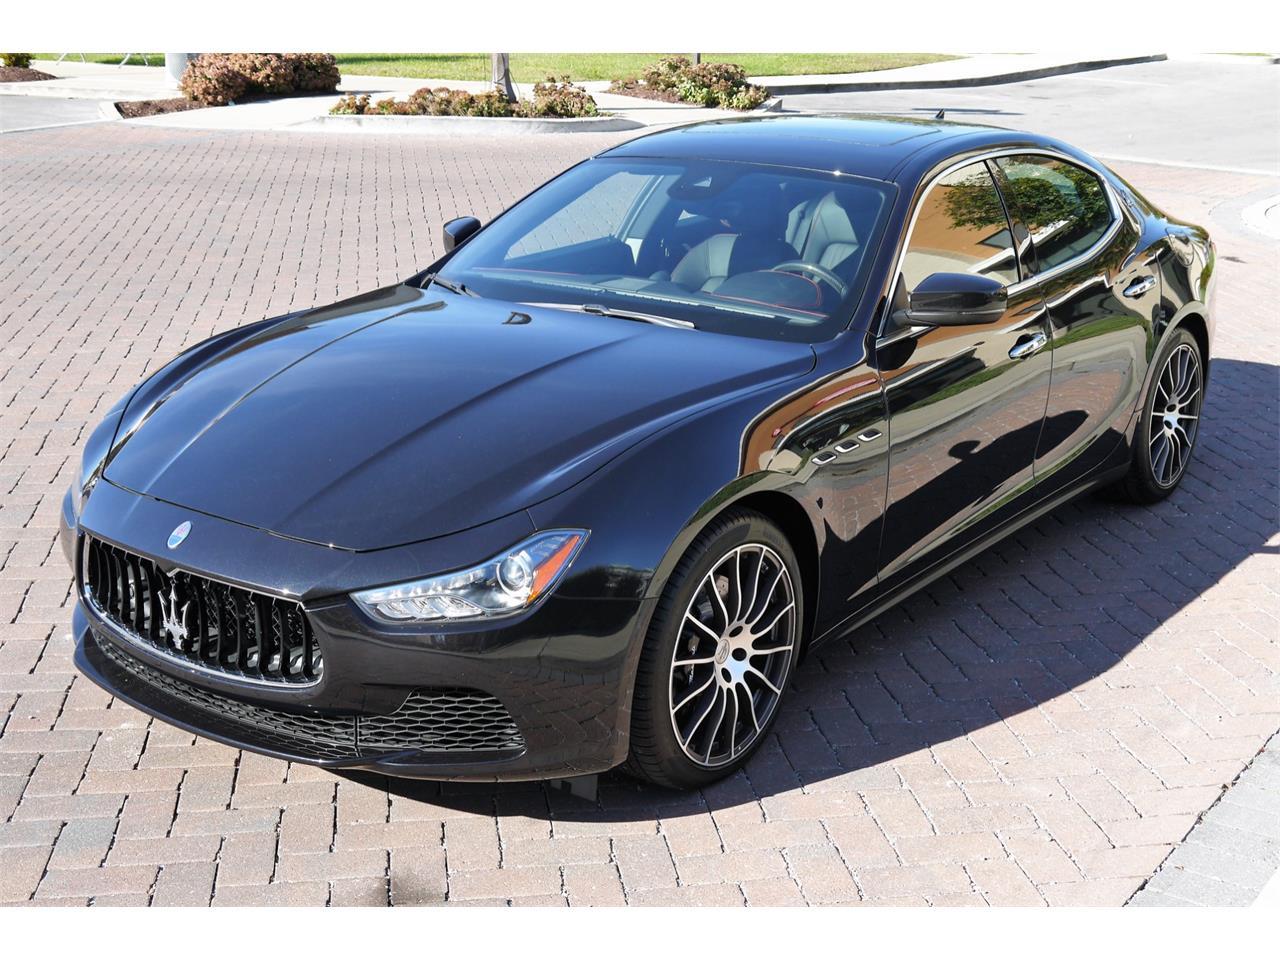 2017 Maserati Ghibli for Sale | ClassicCars.com | CC-1093447